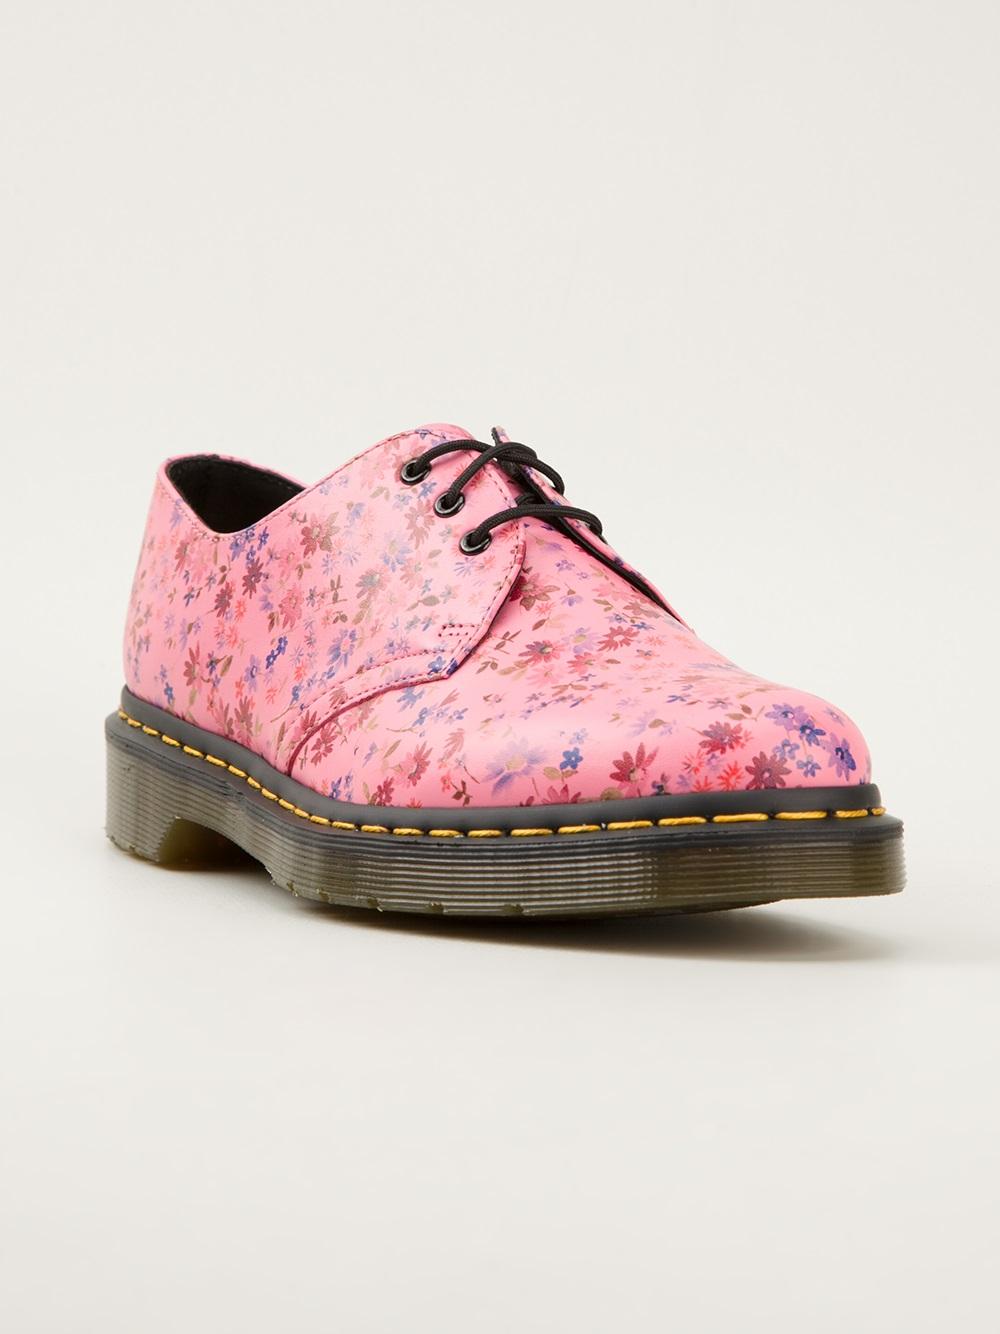 dr martens floral print derby shoes in pink pink